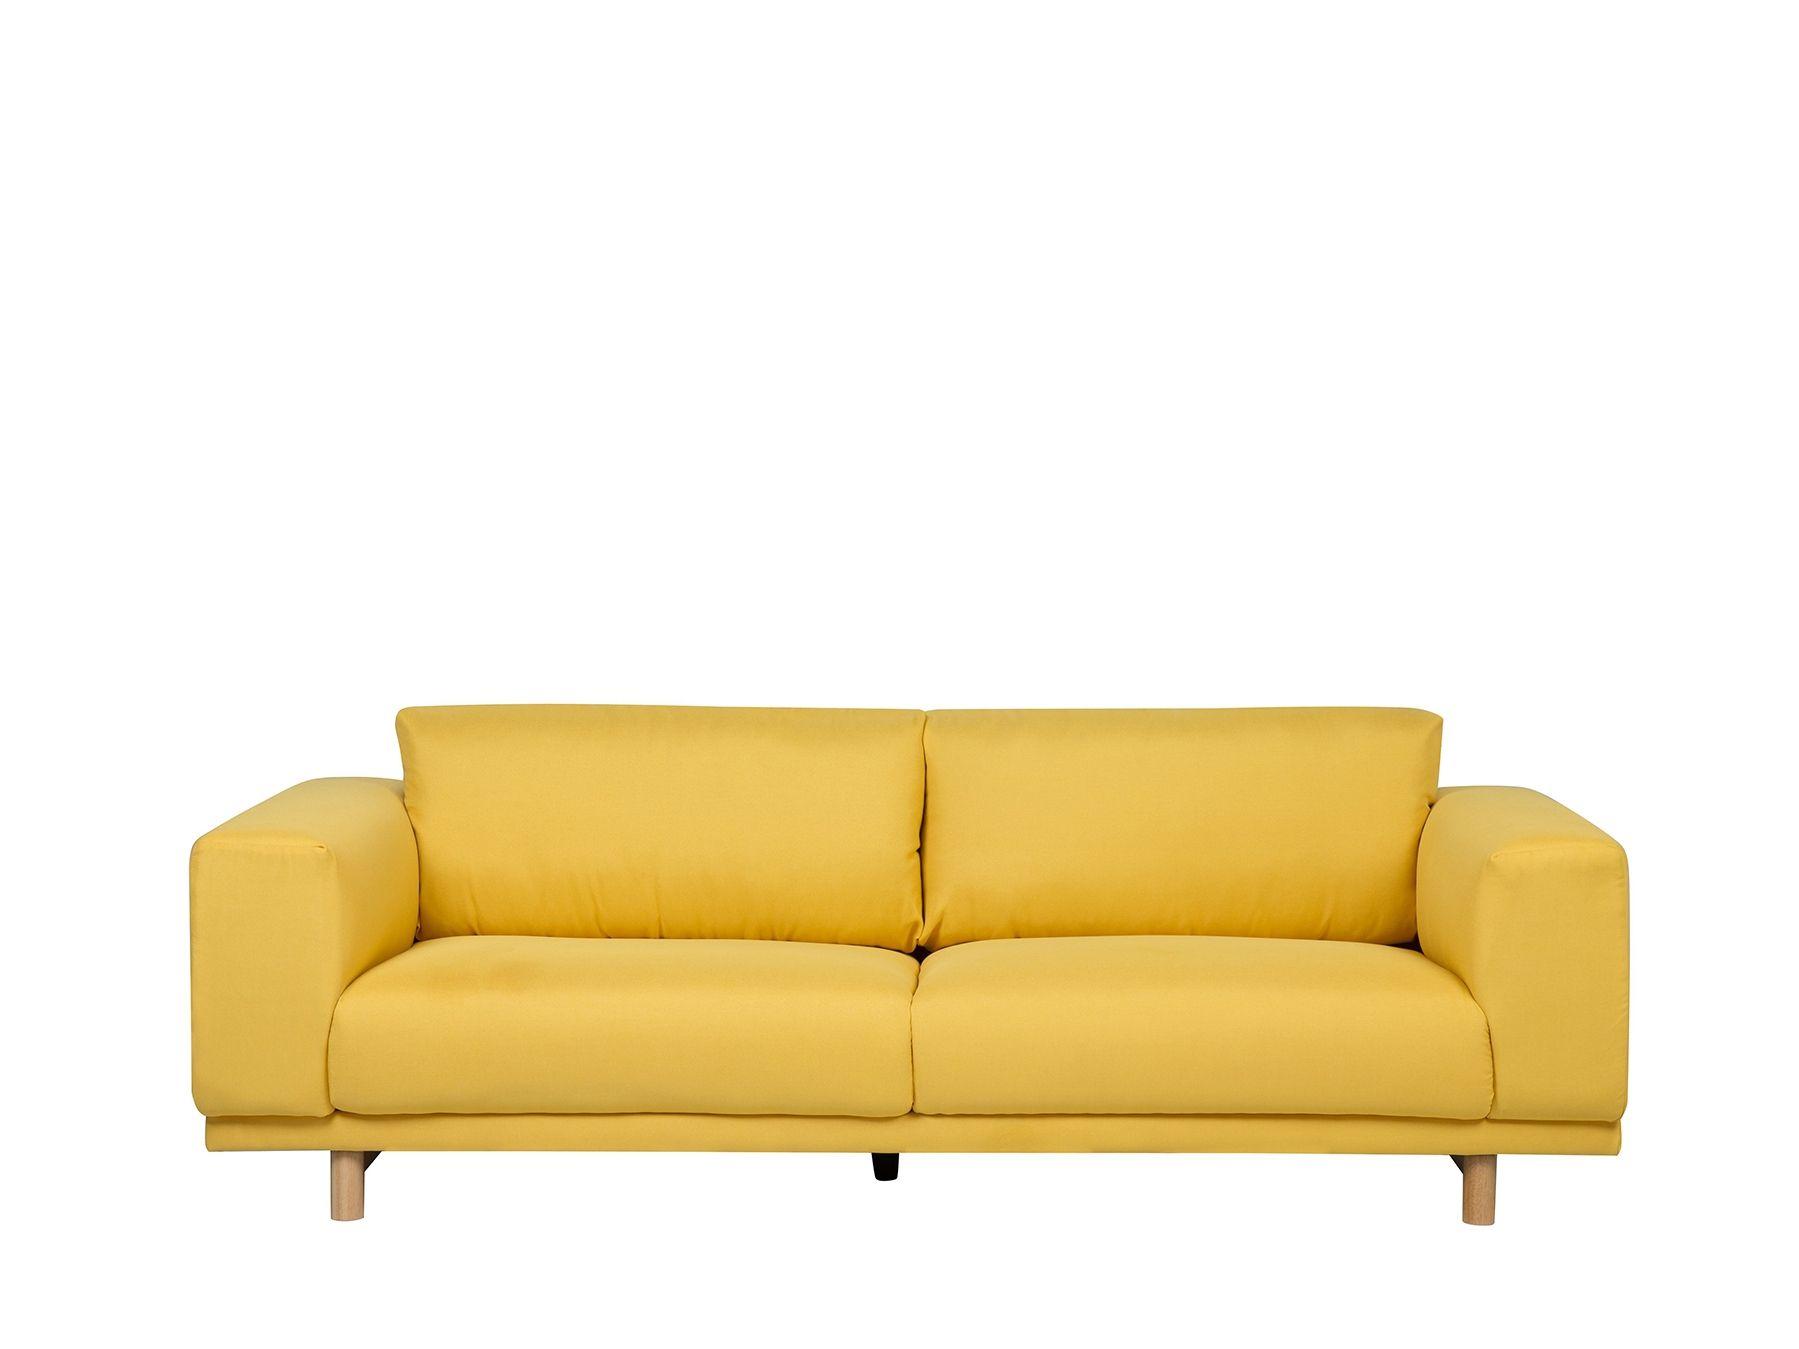 Full Size of Sofa Gelb 3 Sitzer Polsterbezug Nivala Mbel Microfaser Kunstleder Liege Le Corbusier L Mit Schlaffunktion Beziehen Spannbezug Bettfunktion Lila Natura Neu Sofa Sofa Gelb